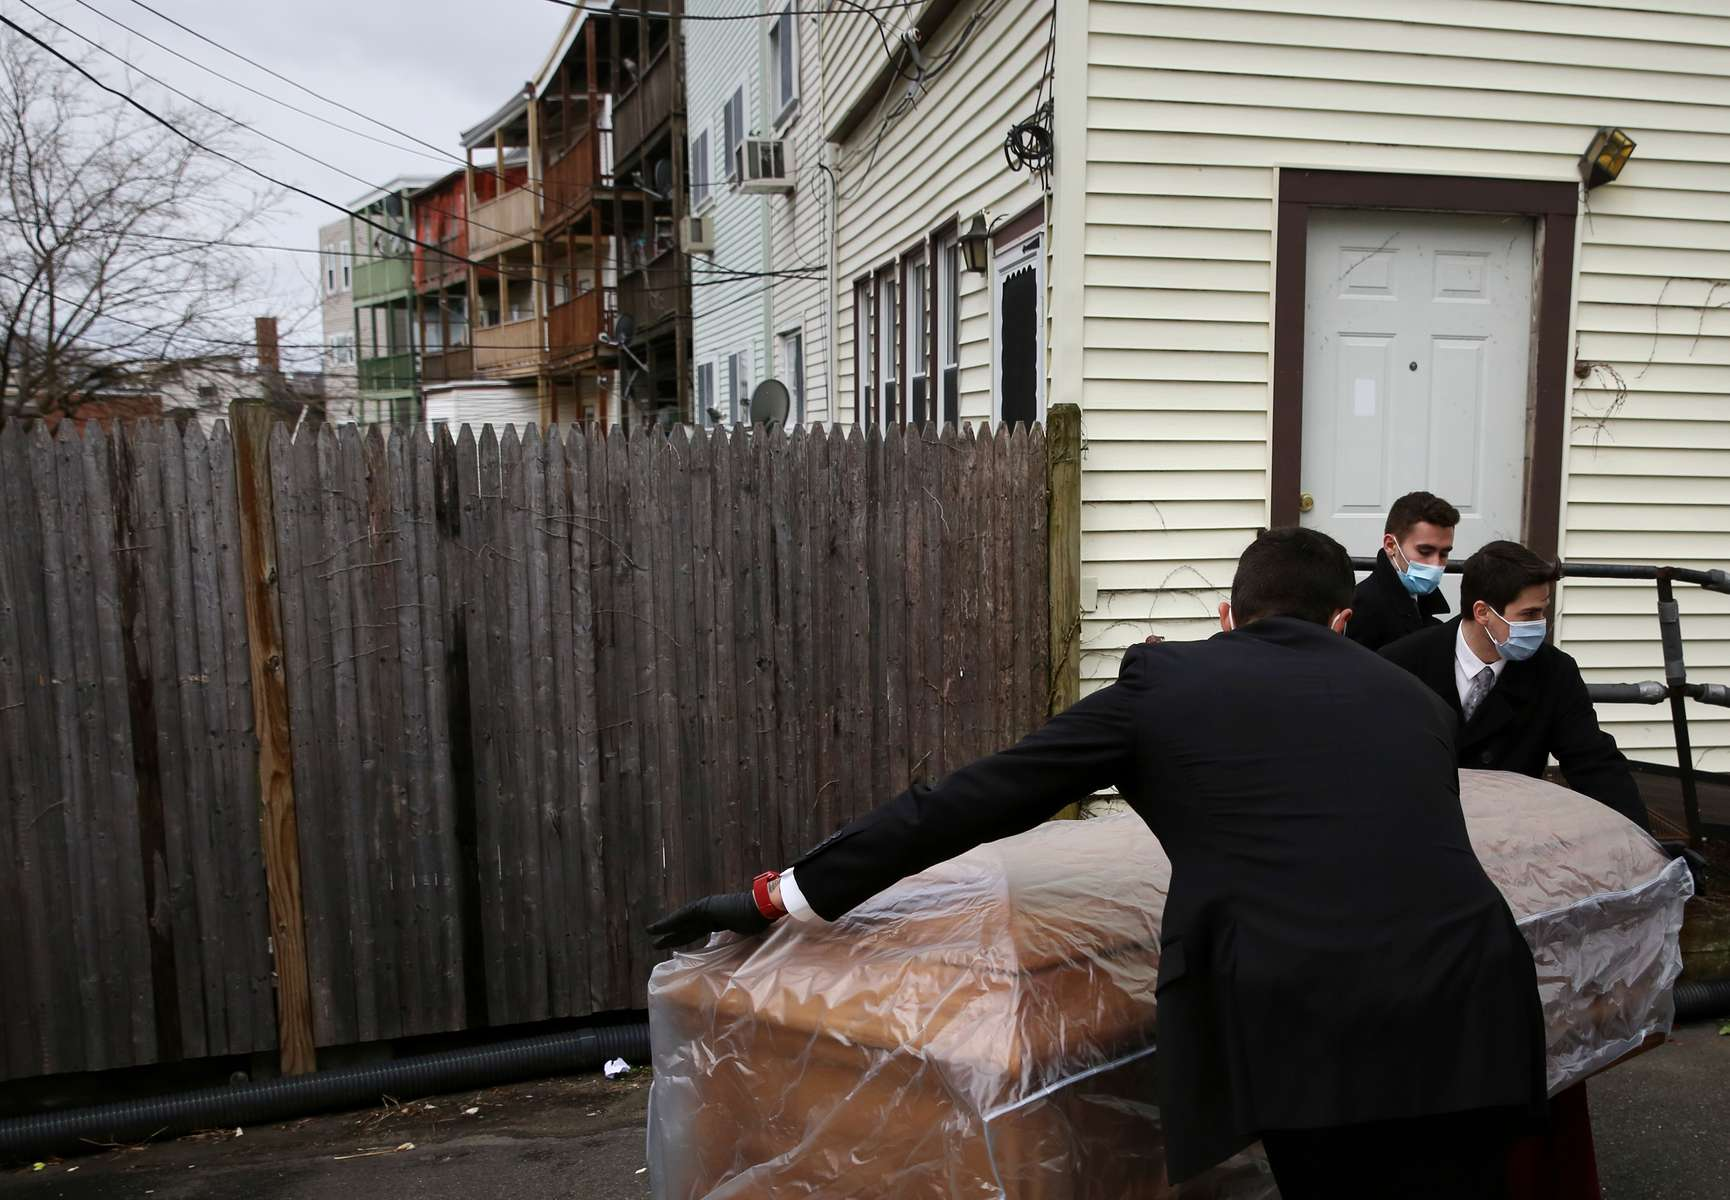 East Boston, MA - 4/28/20 -  (L-R) Matt Tauro, Nick Turco, and John Lockhead move the casket of a woman who died of coronavirus or COVID-19 to the hearse parked outside of Ruggiero Family Memorial Home. (Jessica Rinaldi/Globe Staff)